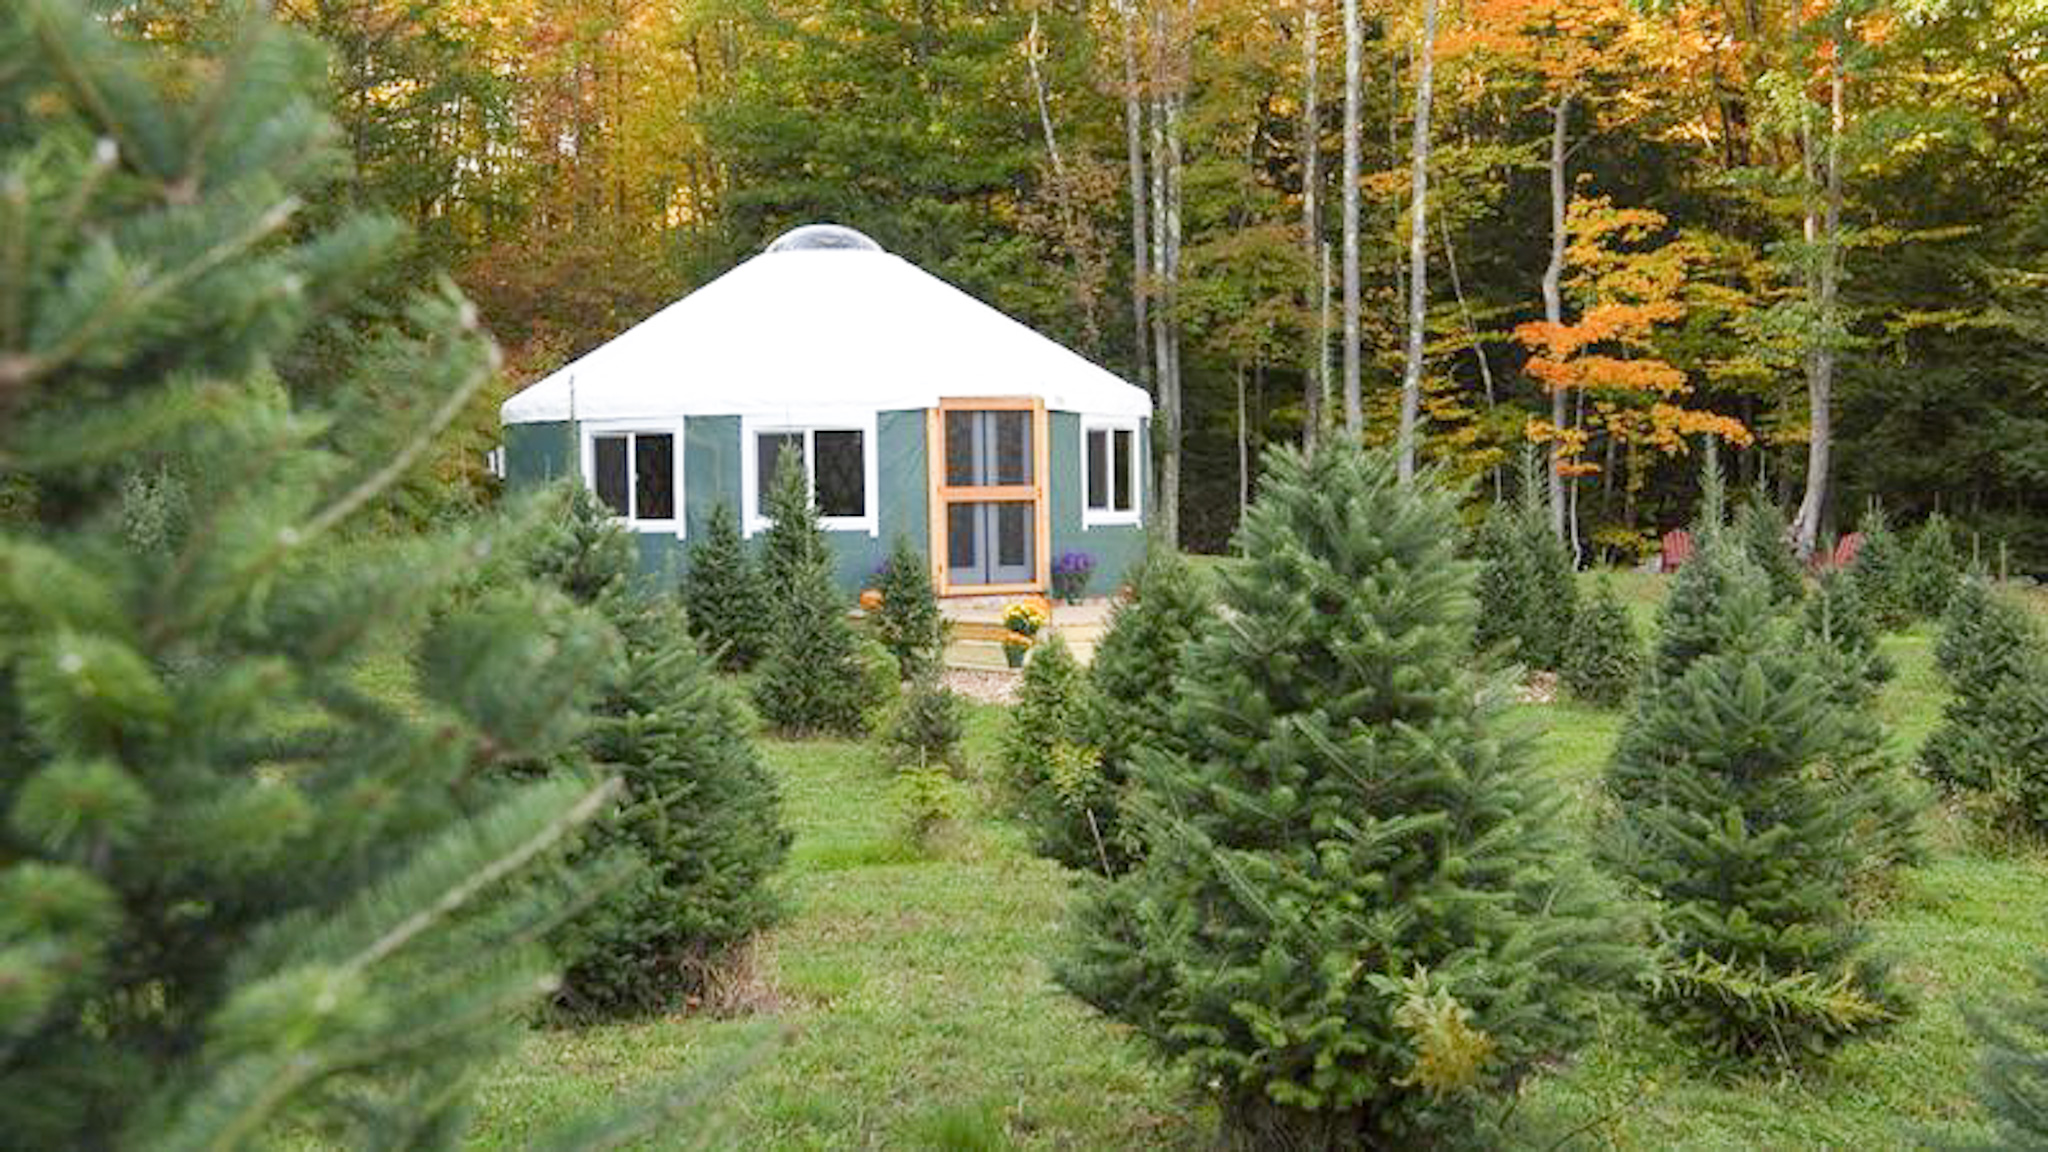 Tuckaway Tree Farm Yurt